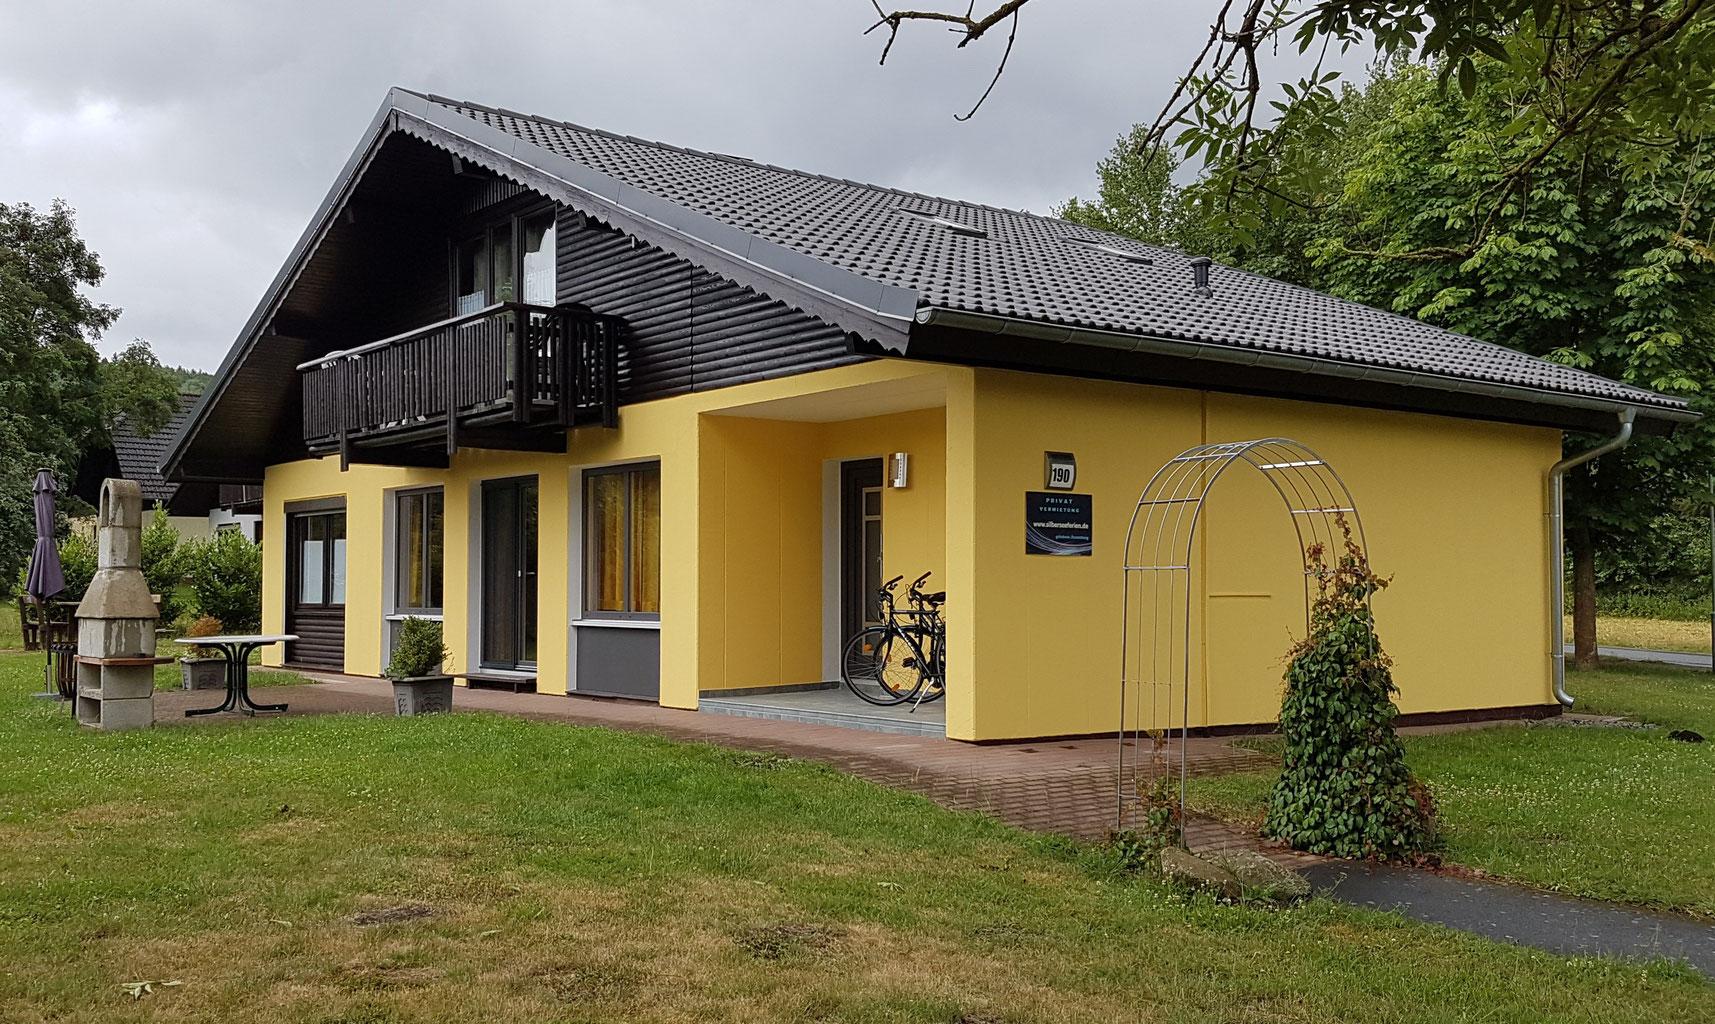 Haus Nr. 190 am Silbersee